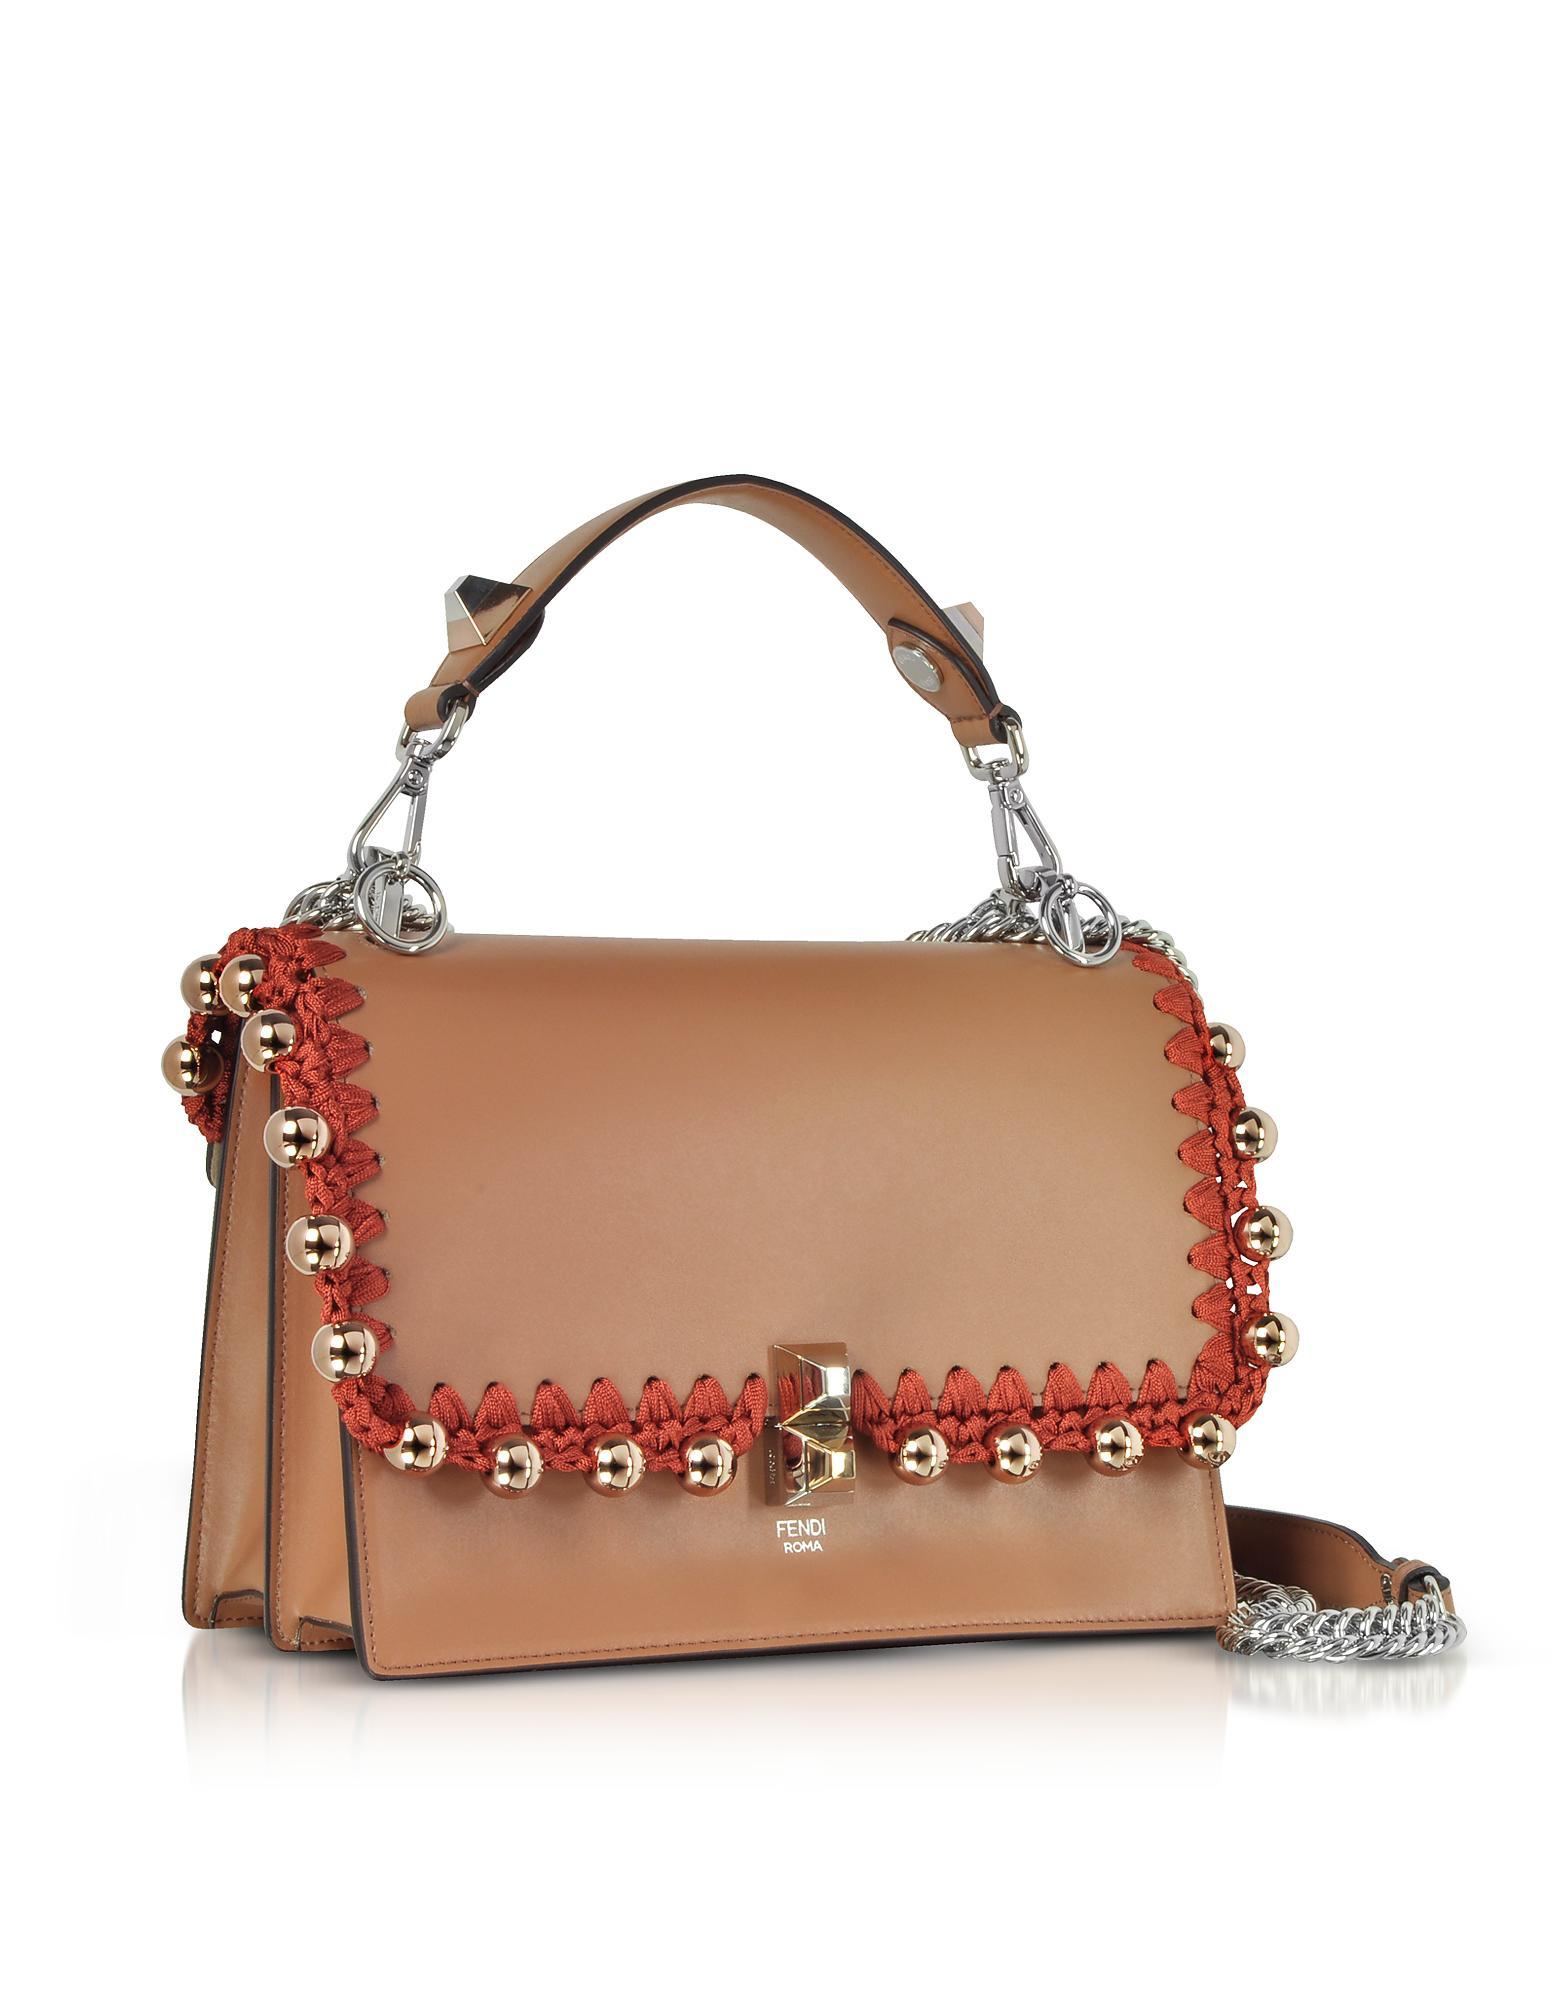 Fendi Kan I M Cuoio Leather Top Handle Shoulder Bag W rose Goltone ... 151b2dface0b7